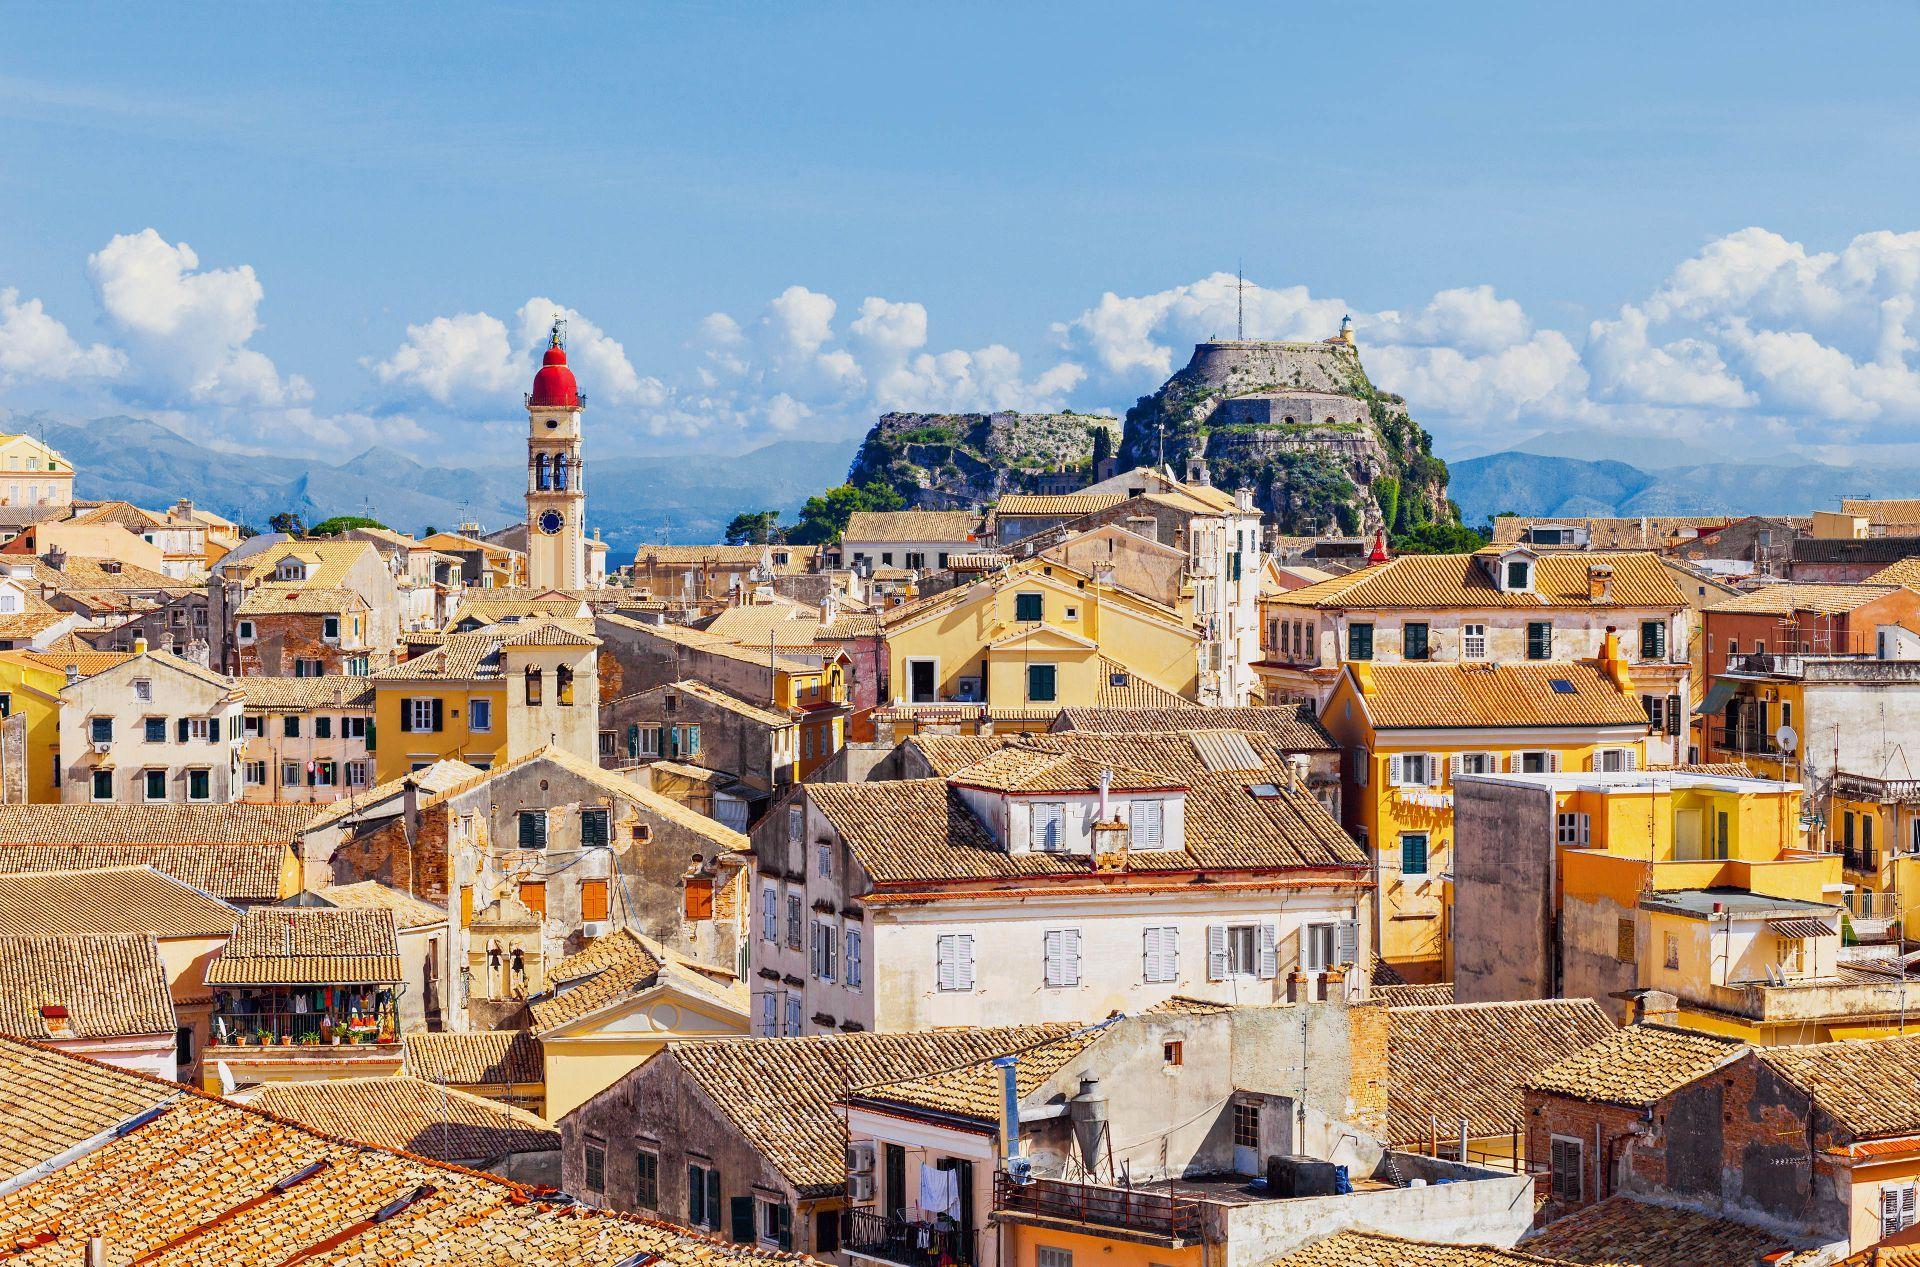 Ionian islands: The main town of Corfu Island